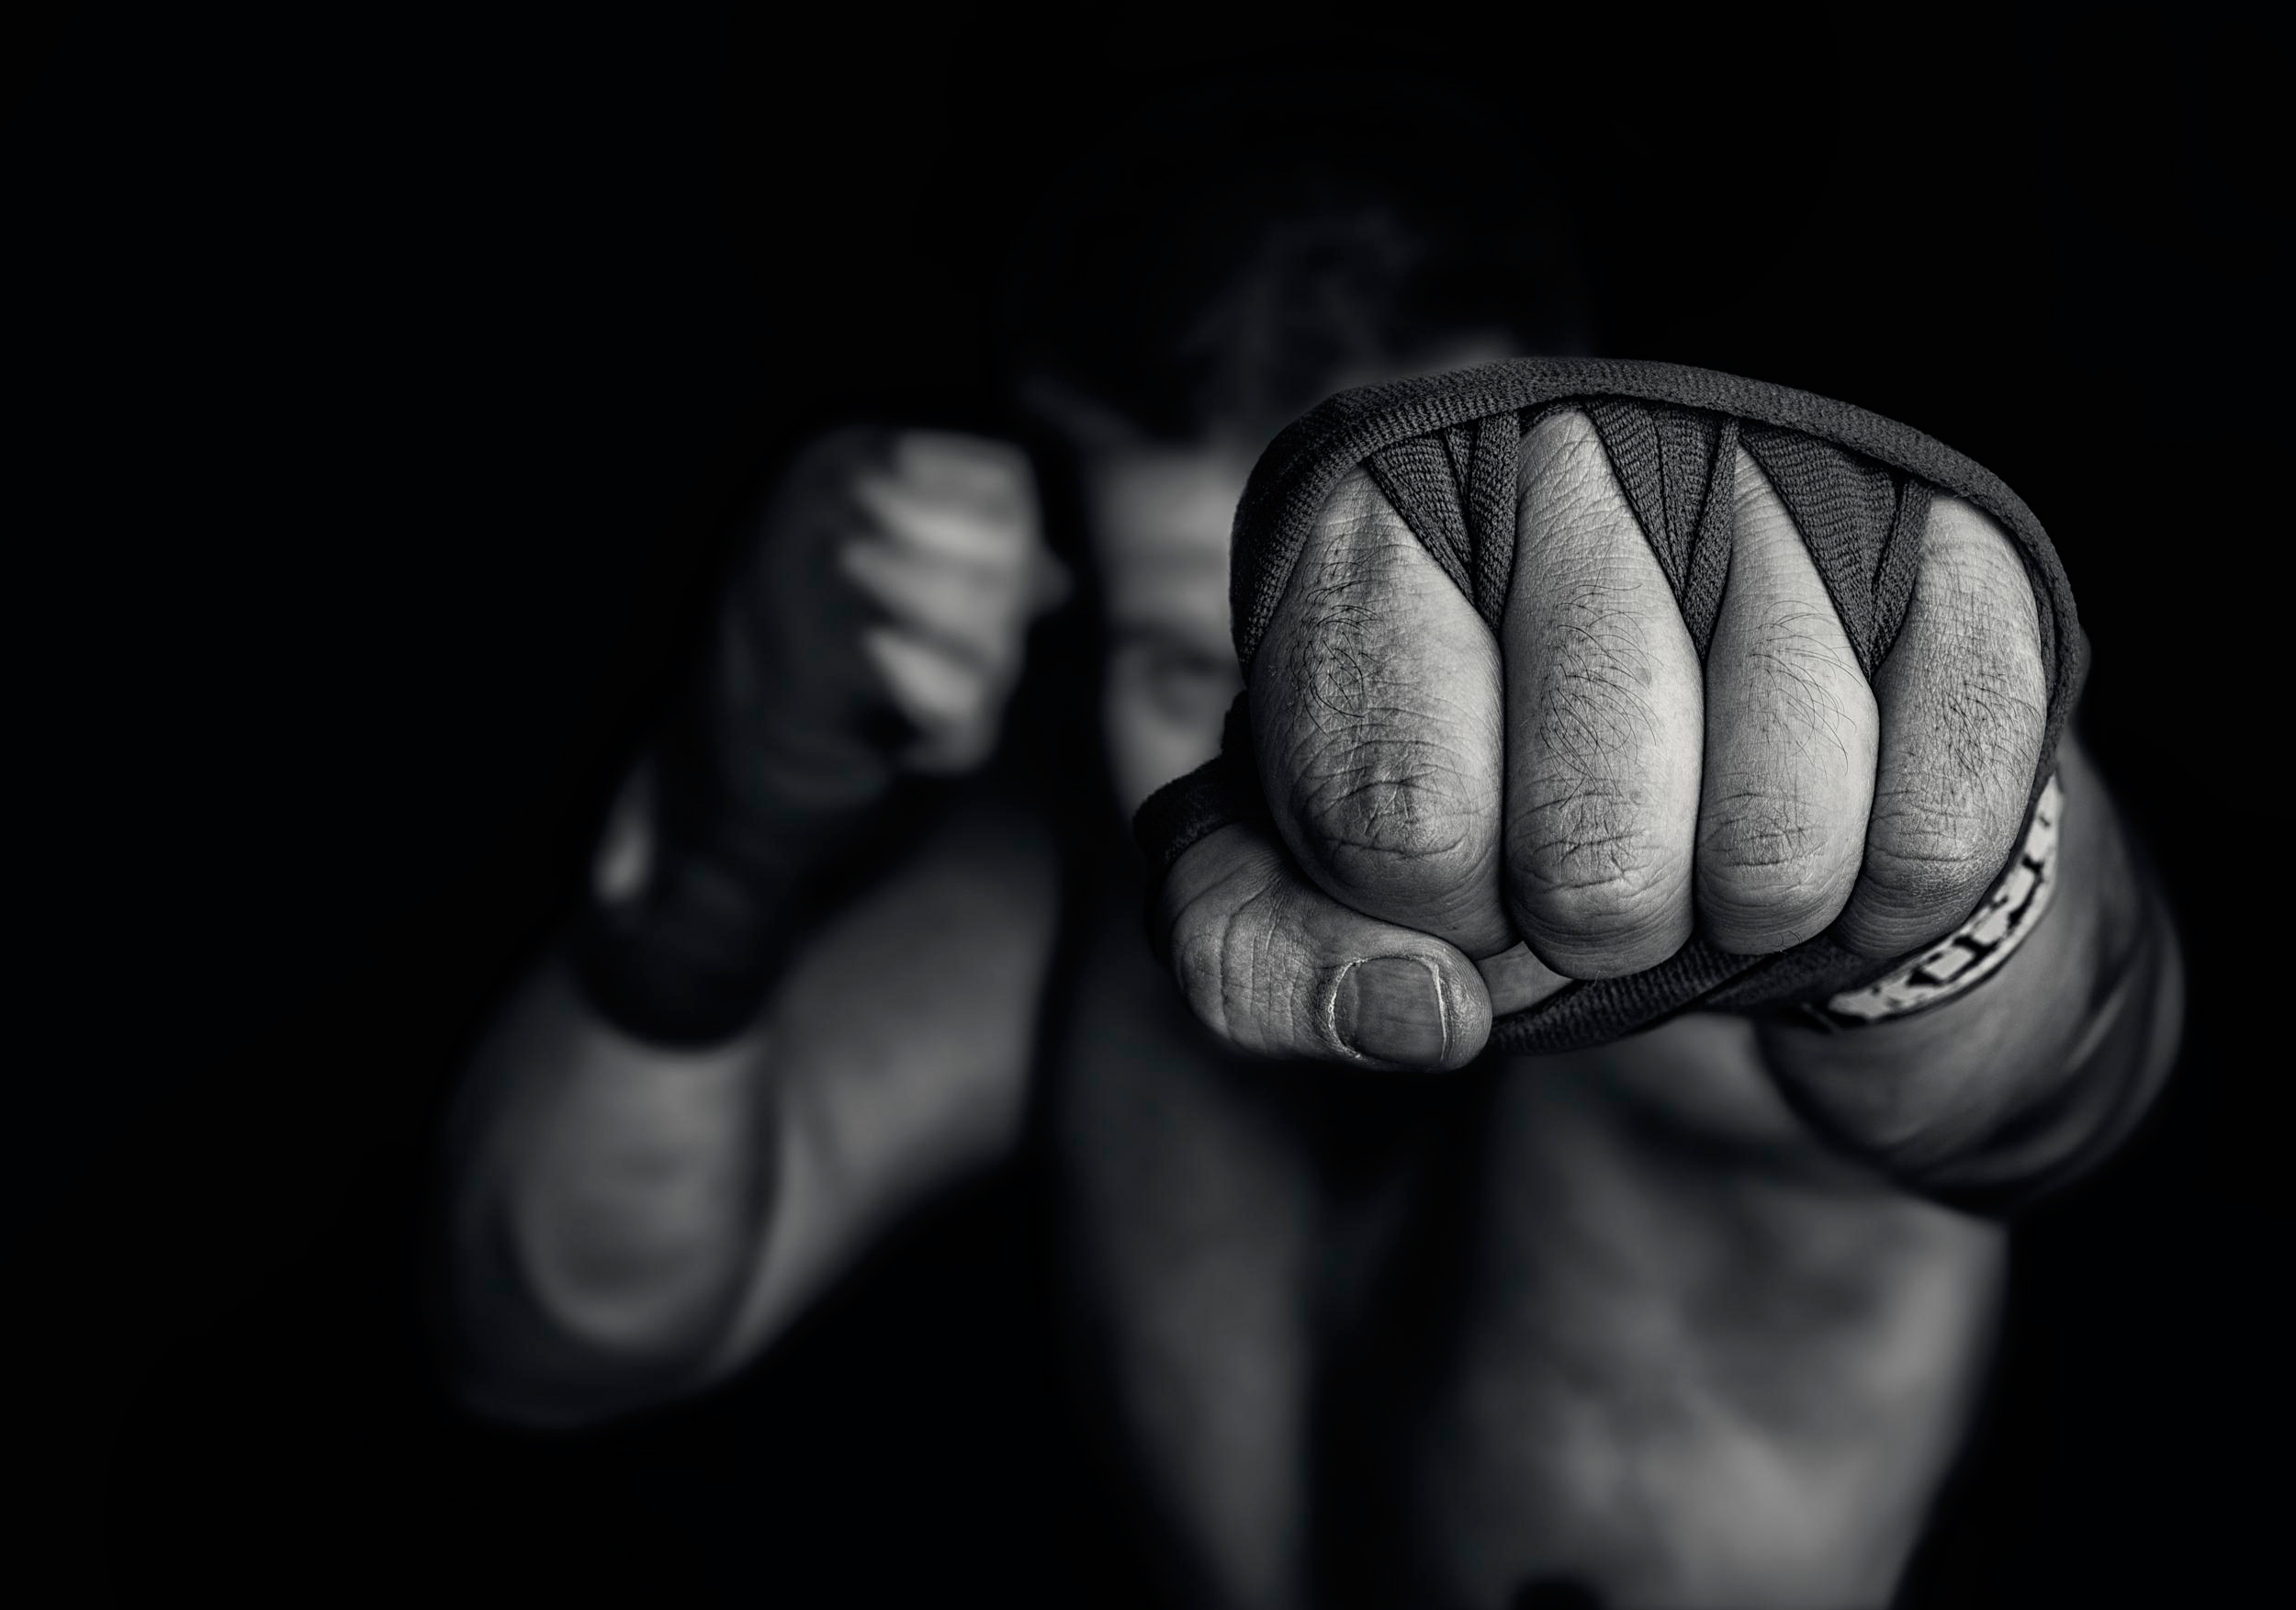 Фото русский кулак 4 фотография